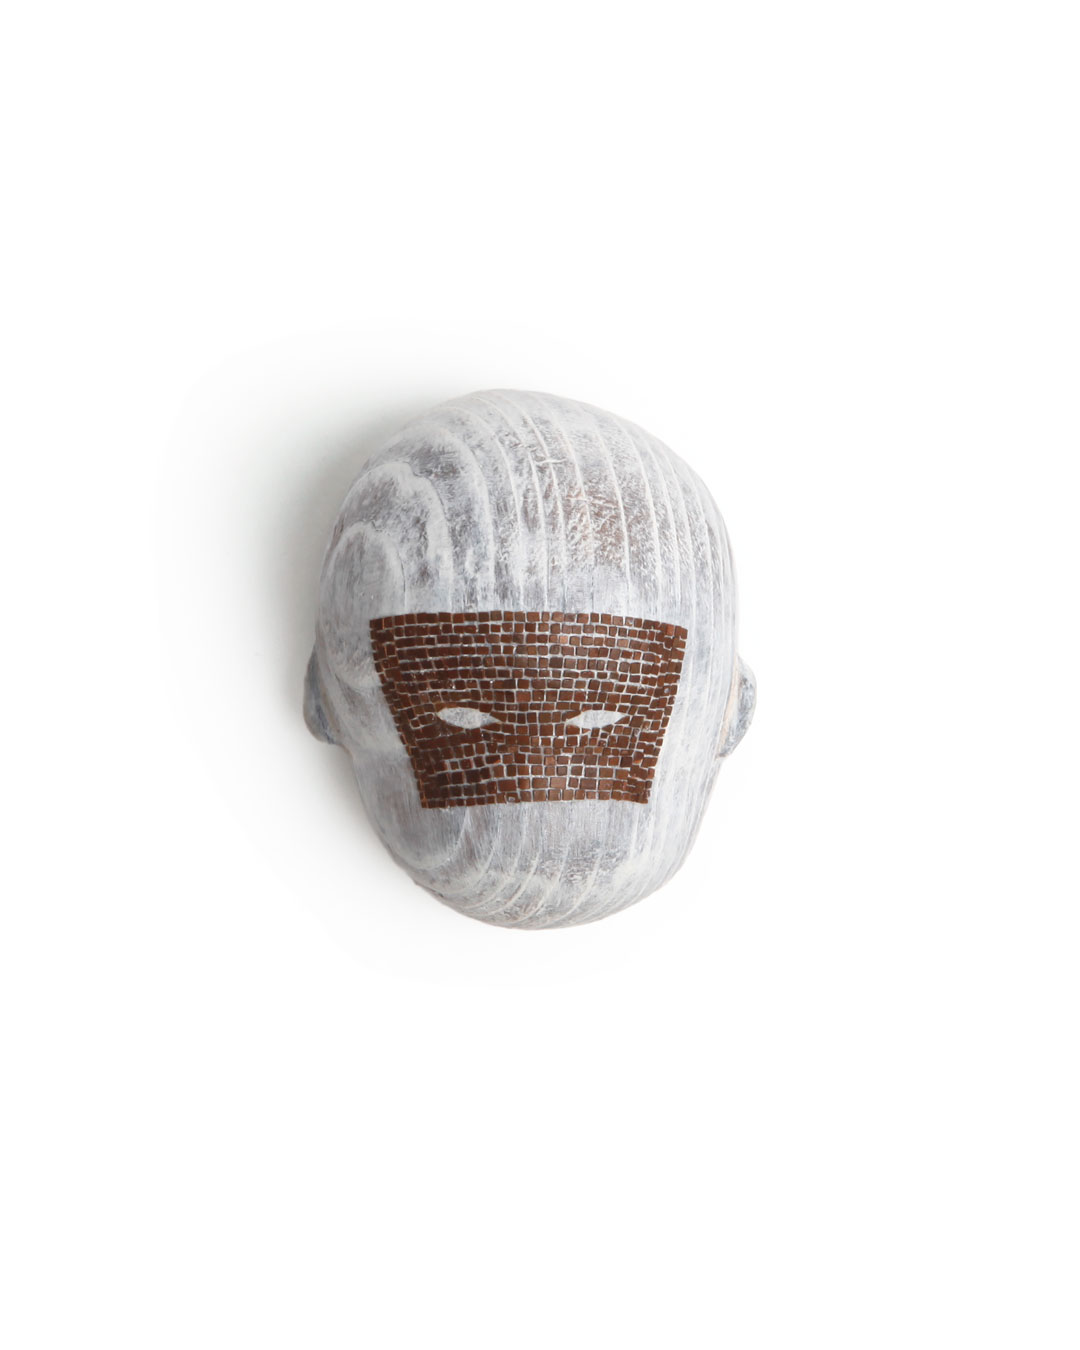 Mari Iwamoto, untitled, 2014, brooch; wood, chestnut, paint, silver, 90 x 90 x 50 mm, €390